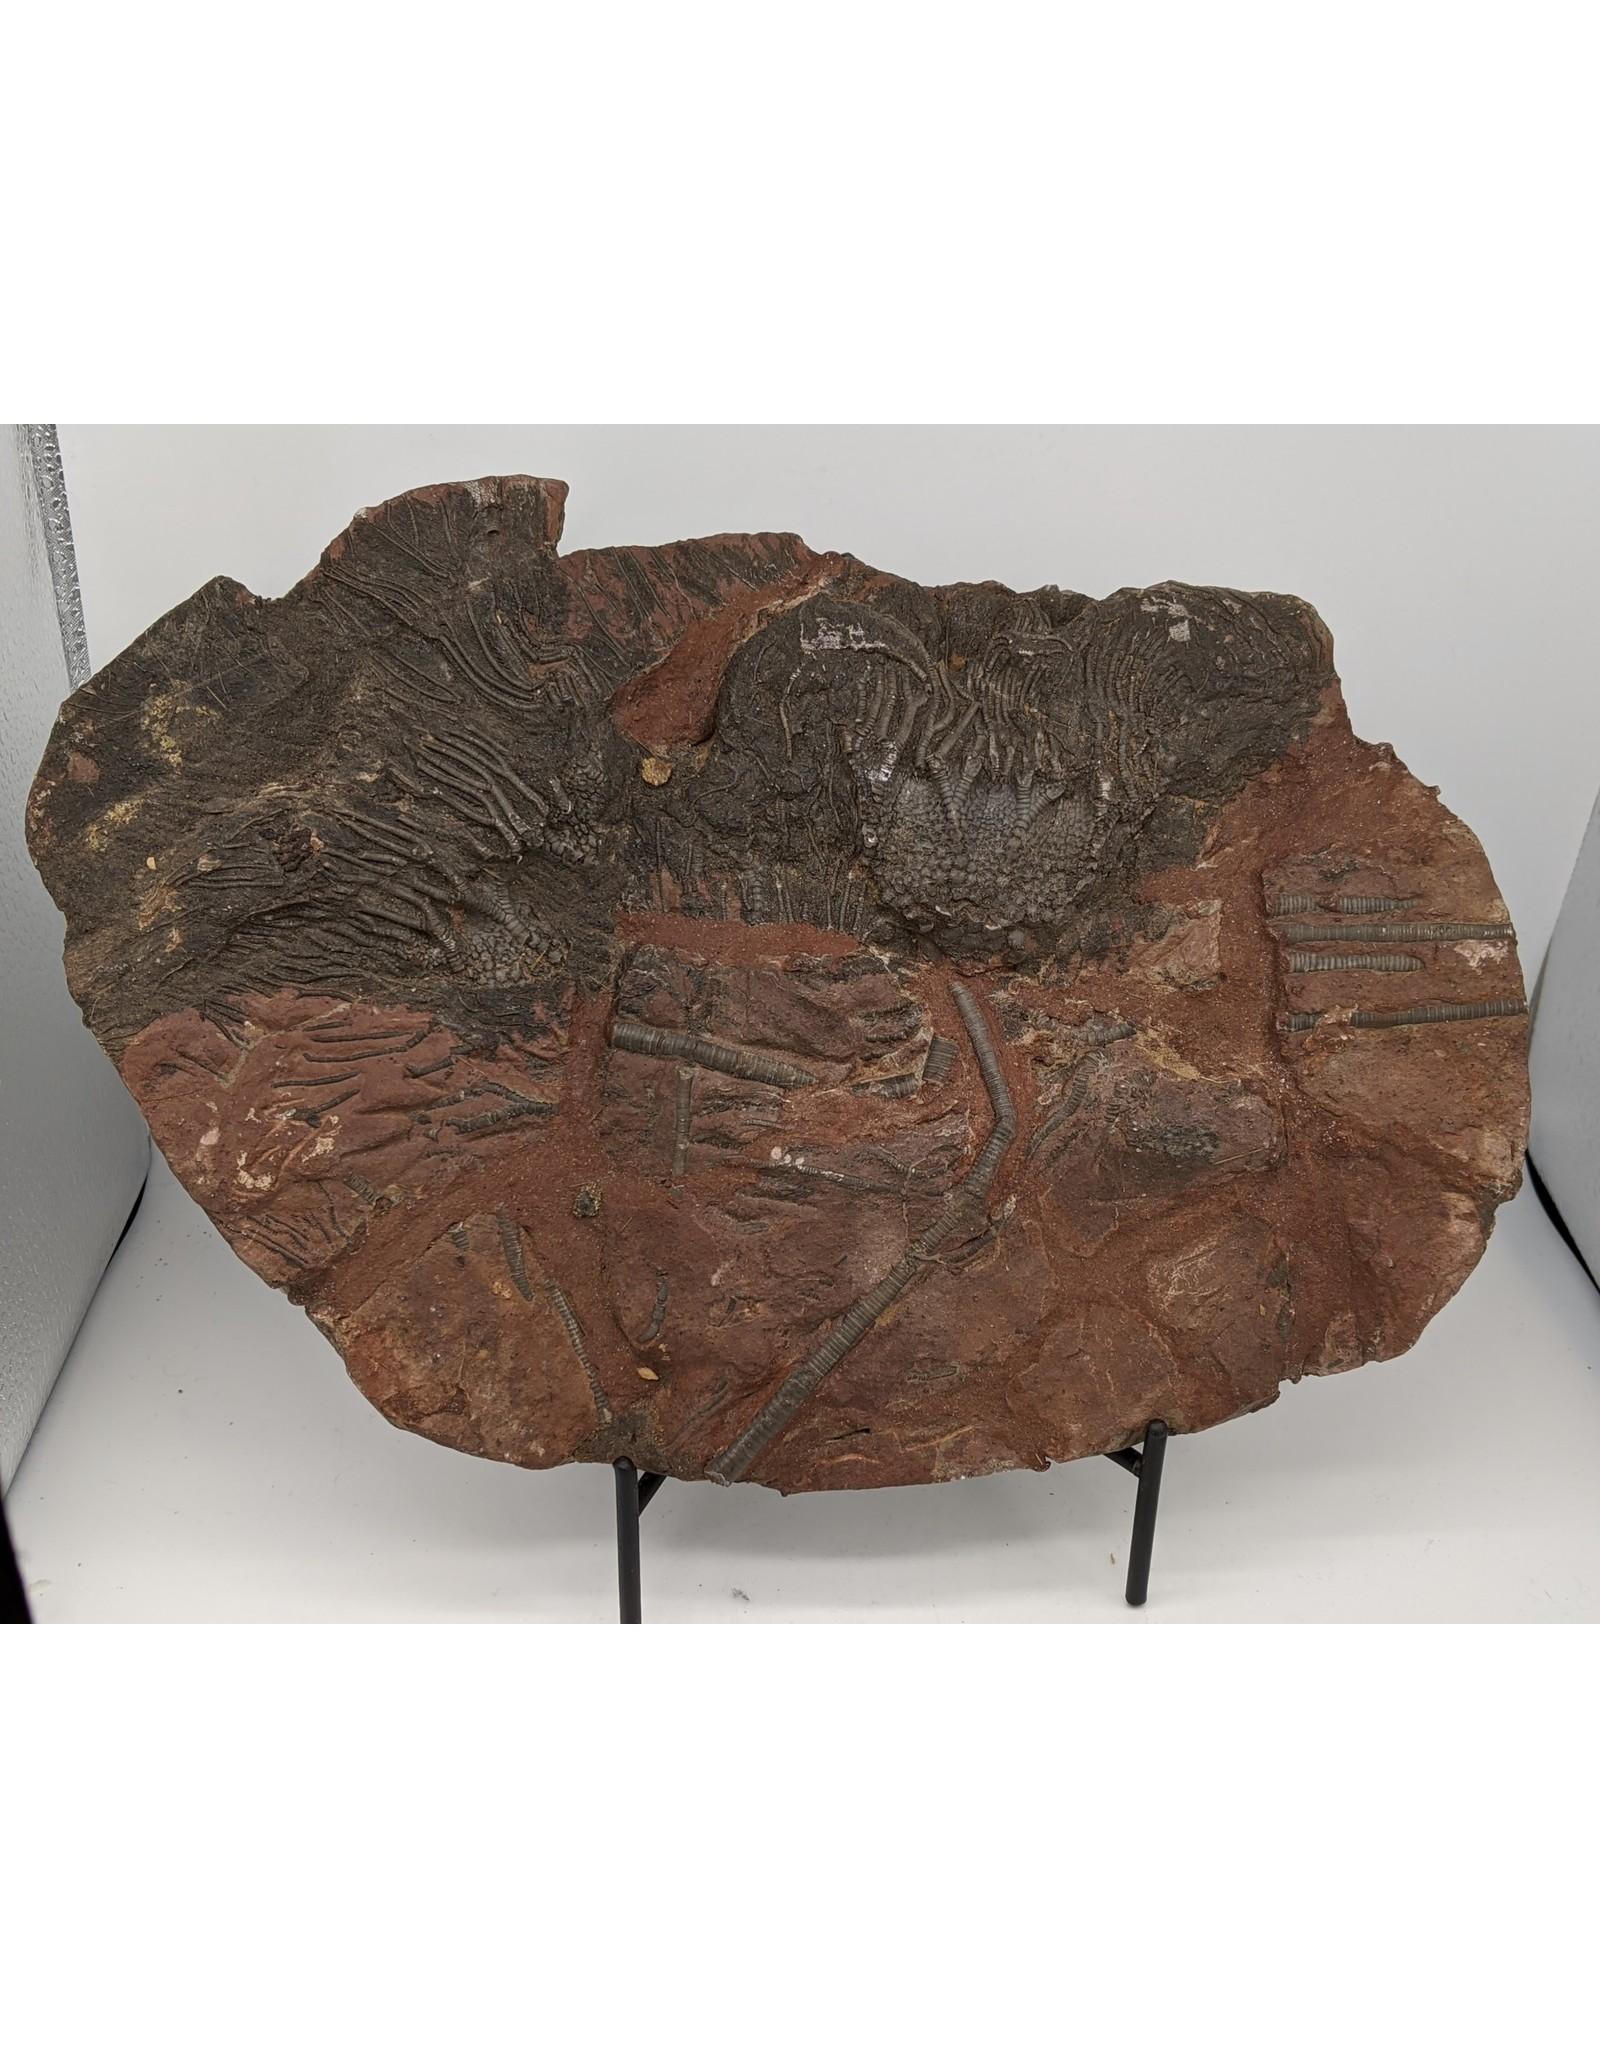 Fossil Crinoid Plate (Erfoud, Morocco) Upper Silurian, 420 MYA